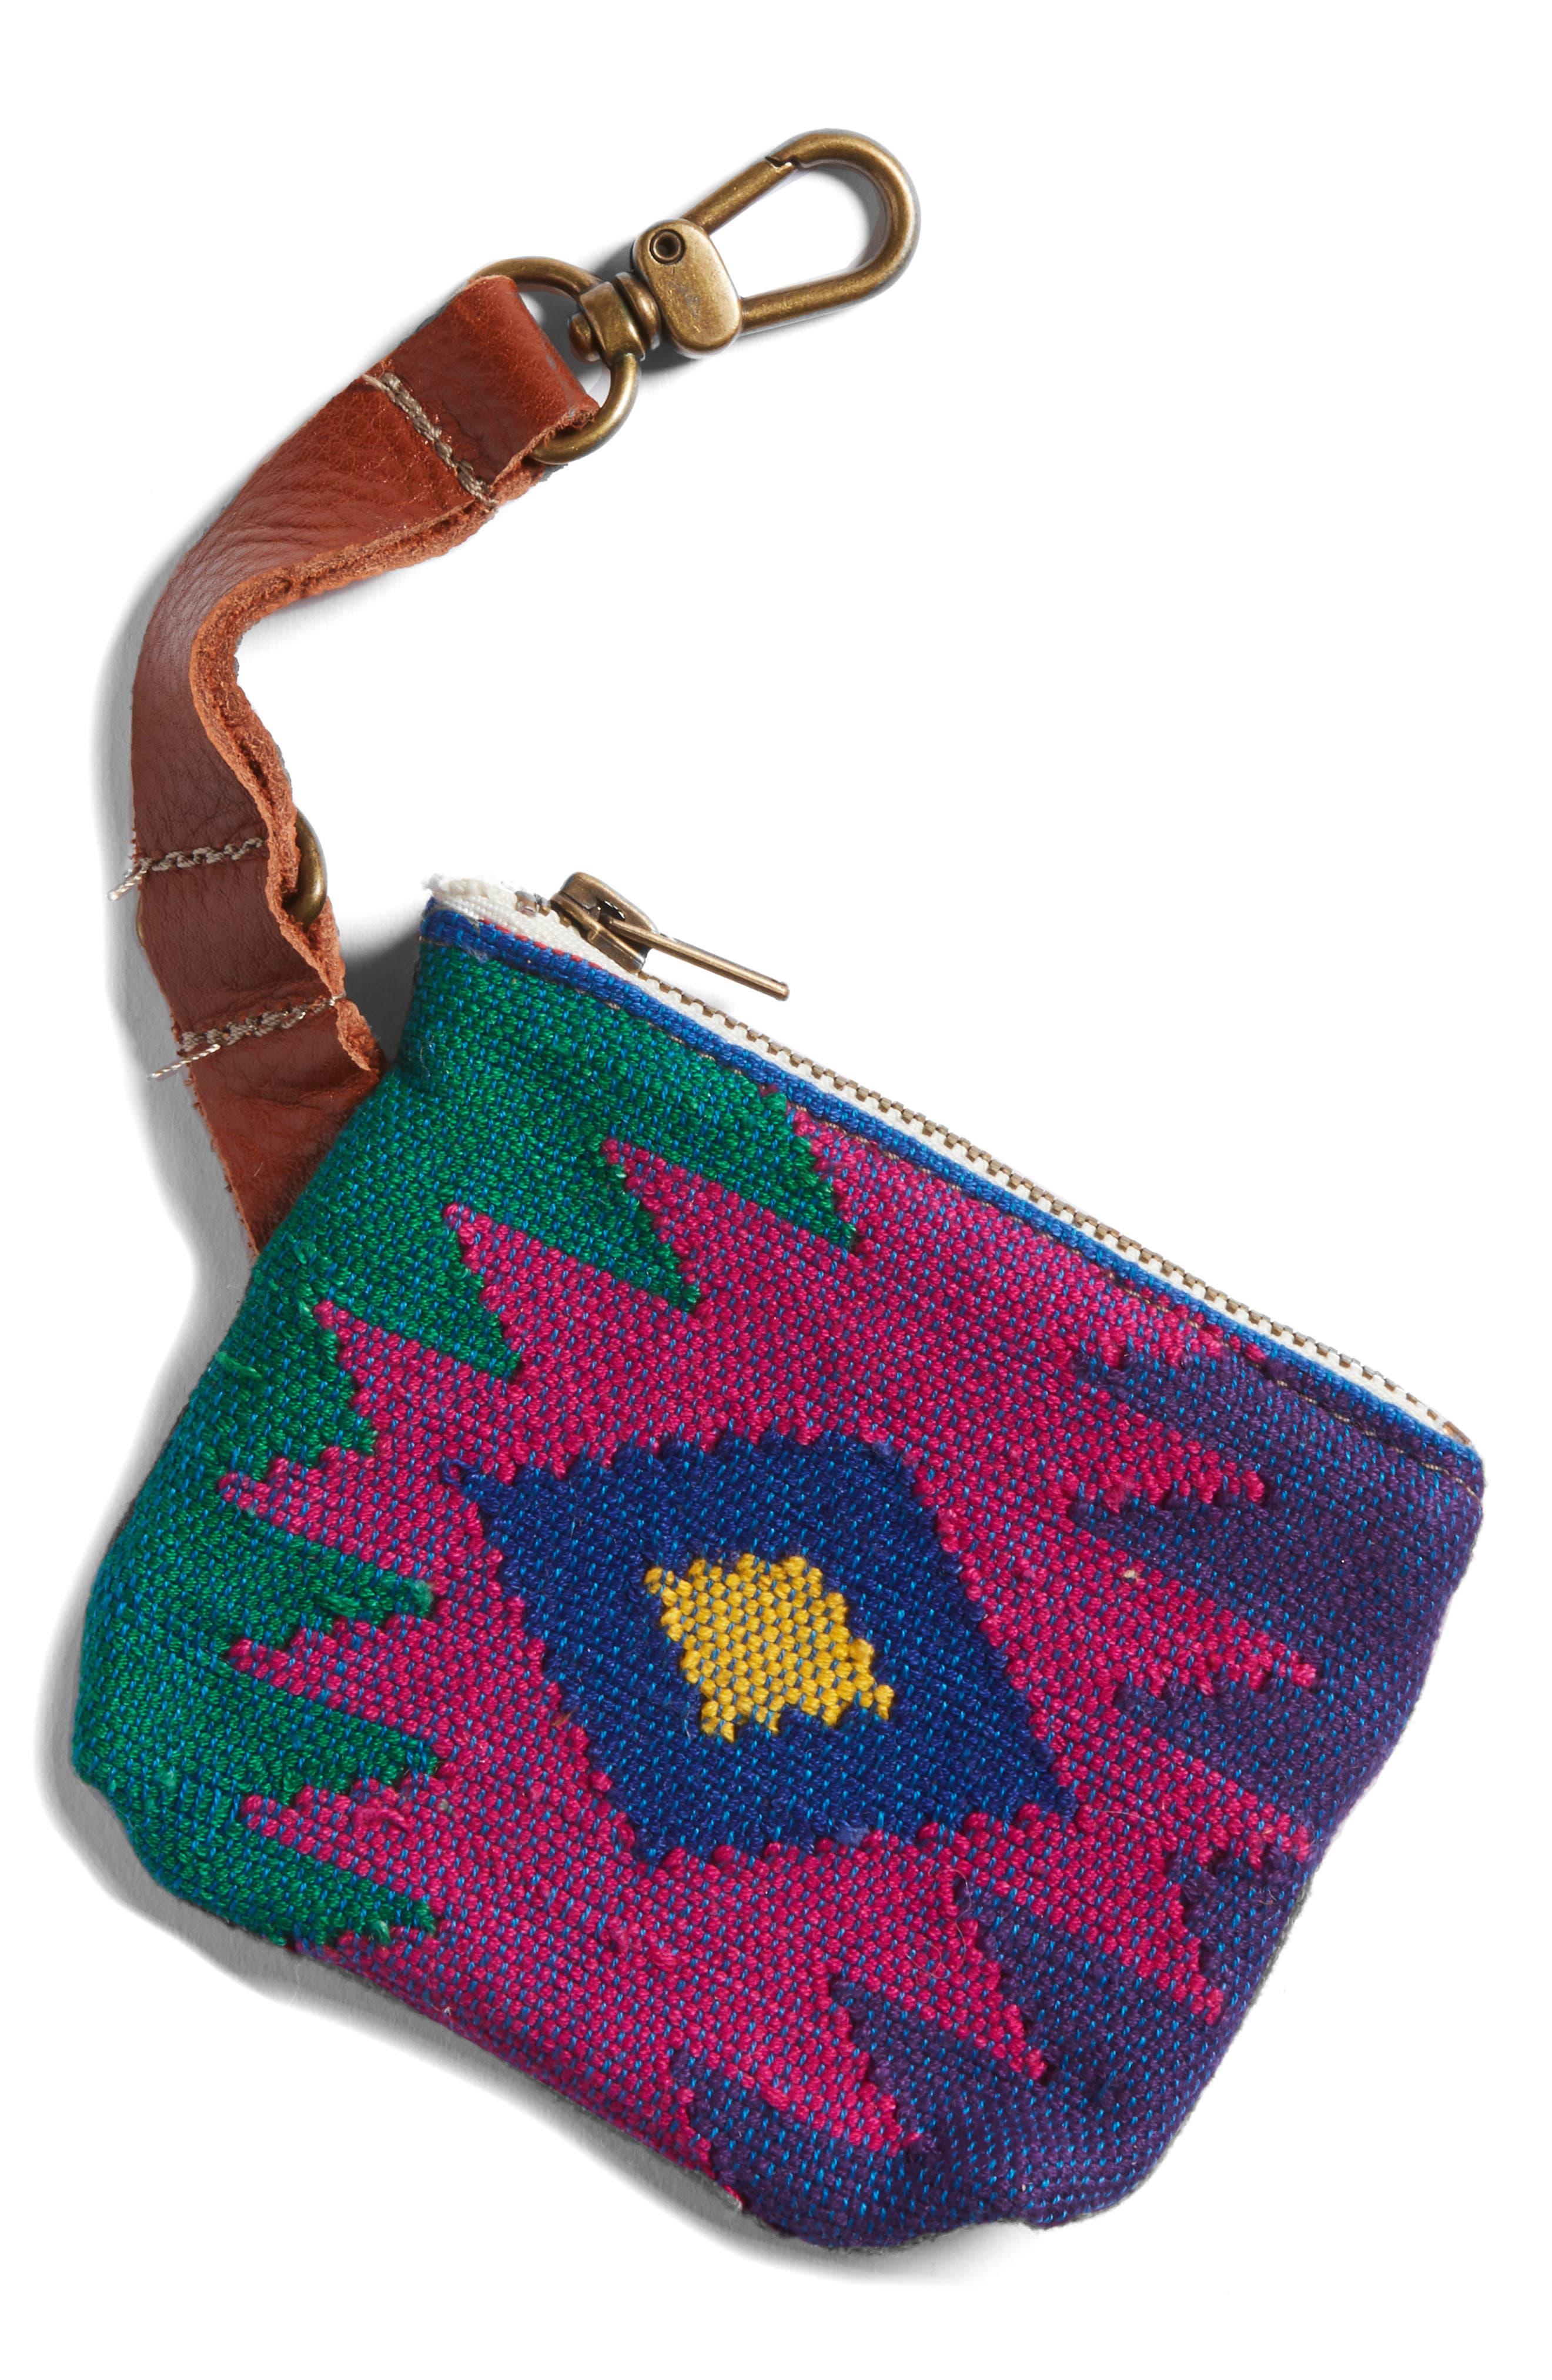 Oaxaca Sunburst Waste Bag Pouch,                             Main thumbnail 1, color,                             960